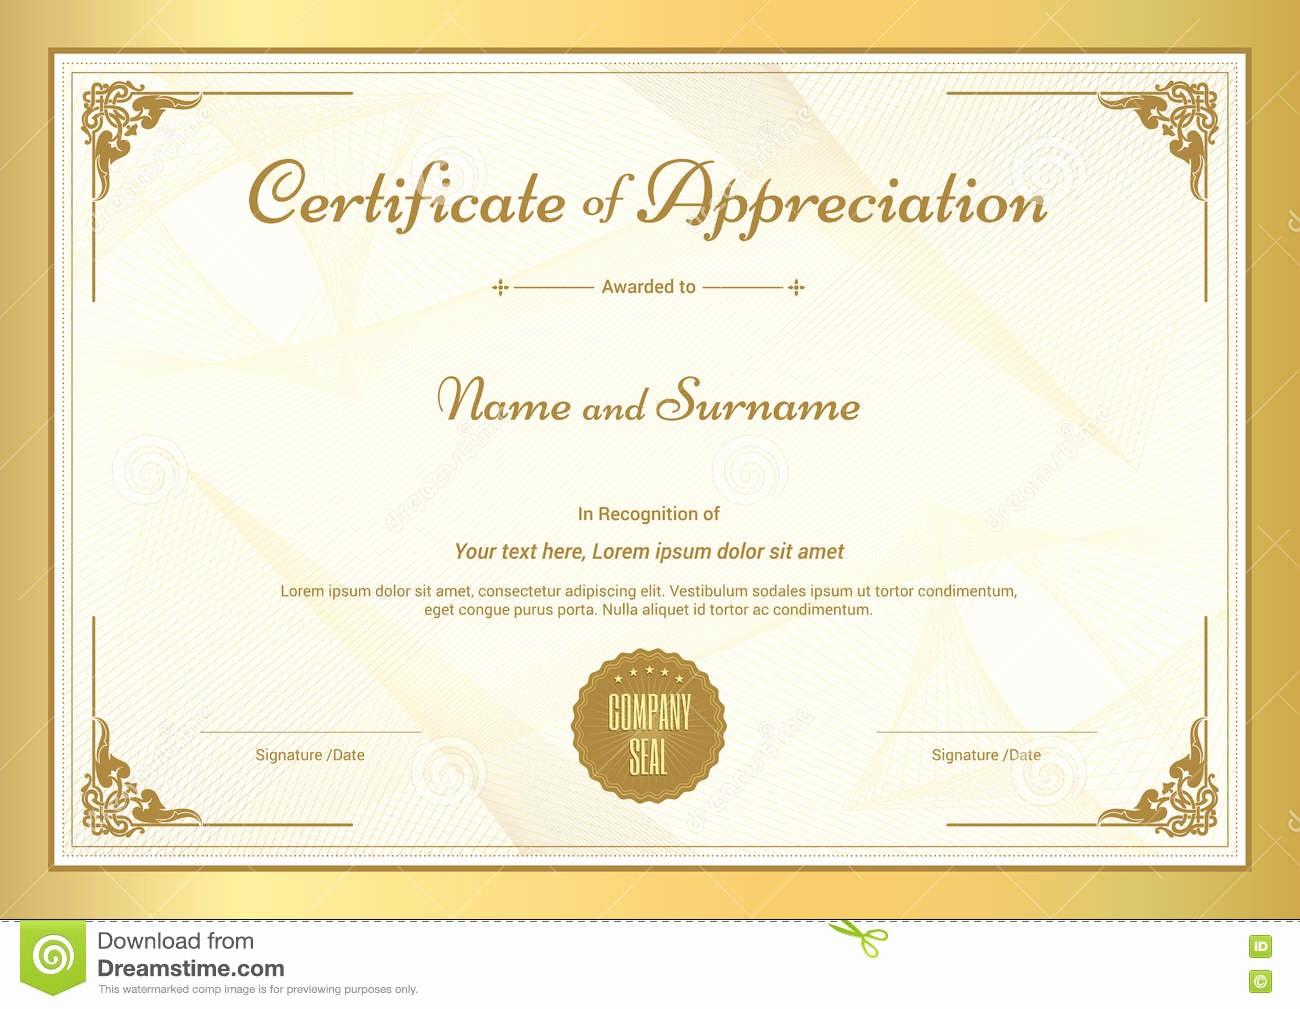 Border for Certificate Of Appreciation Elegant Certificate Appreciation Template with Gold Border